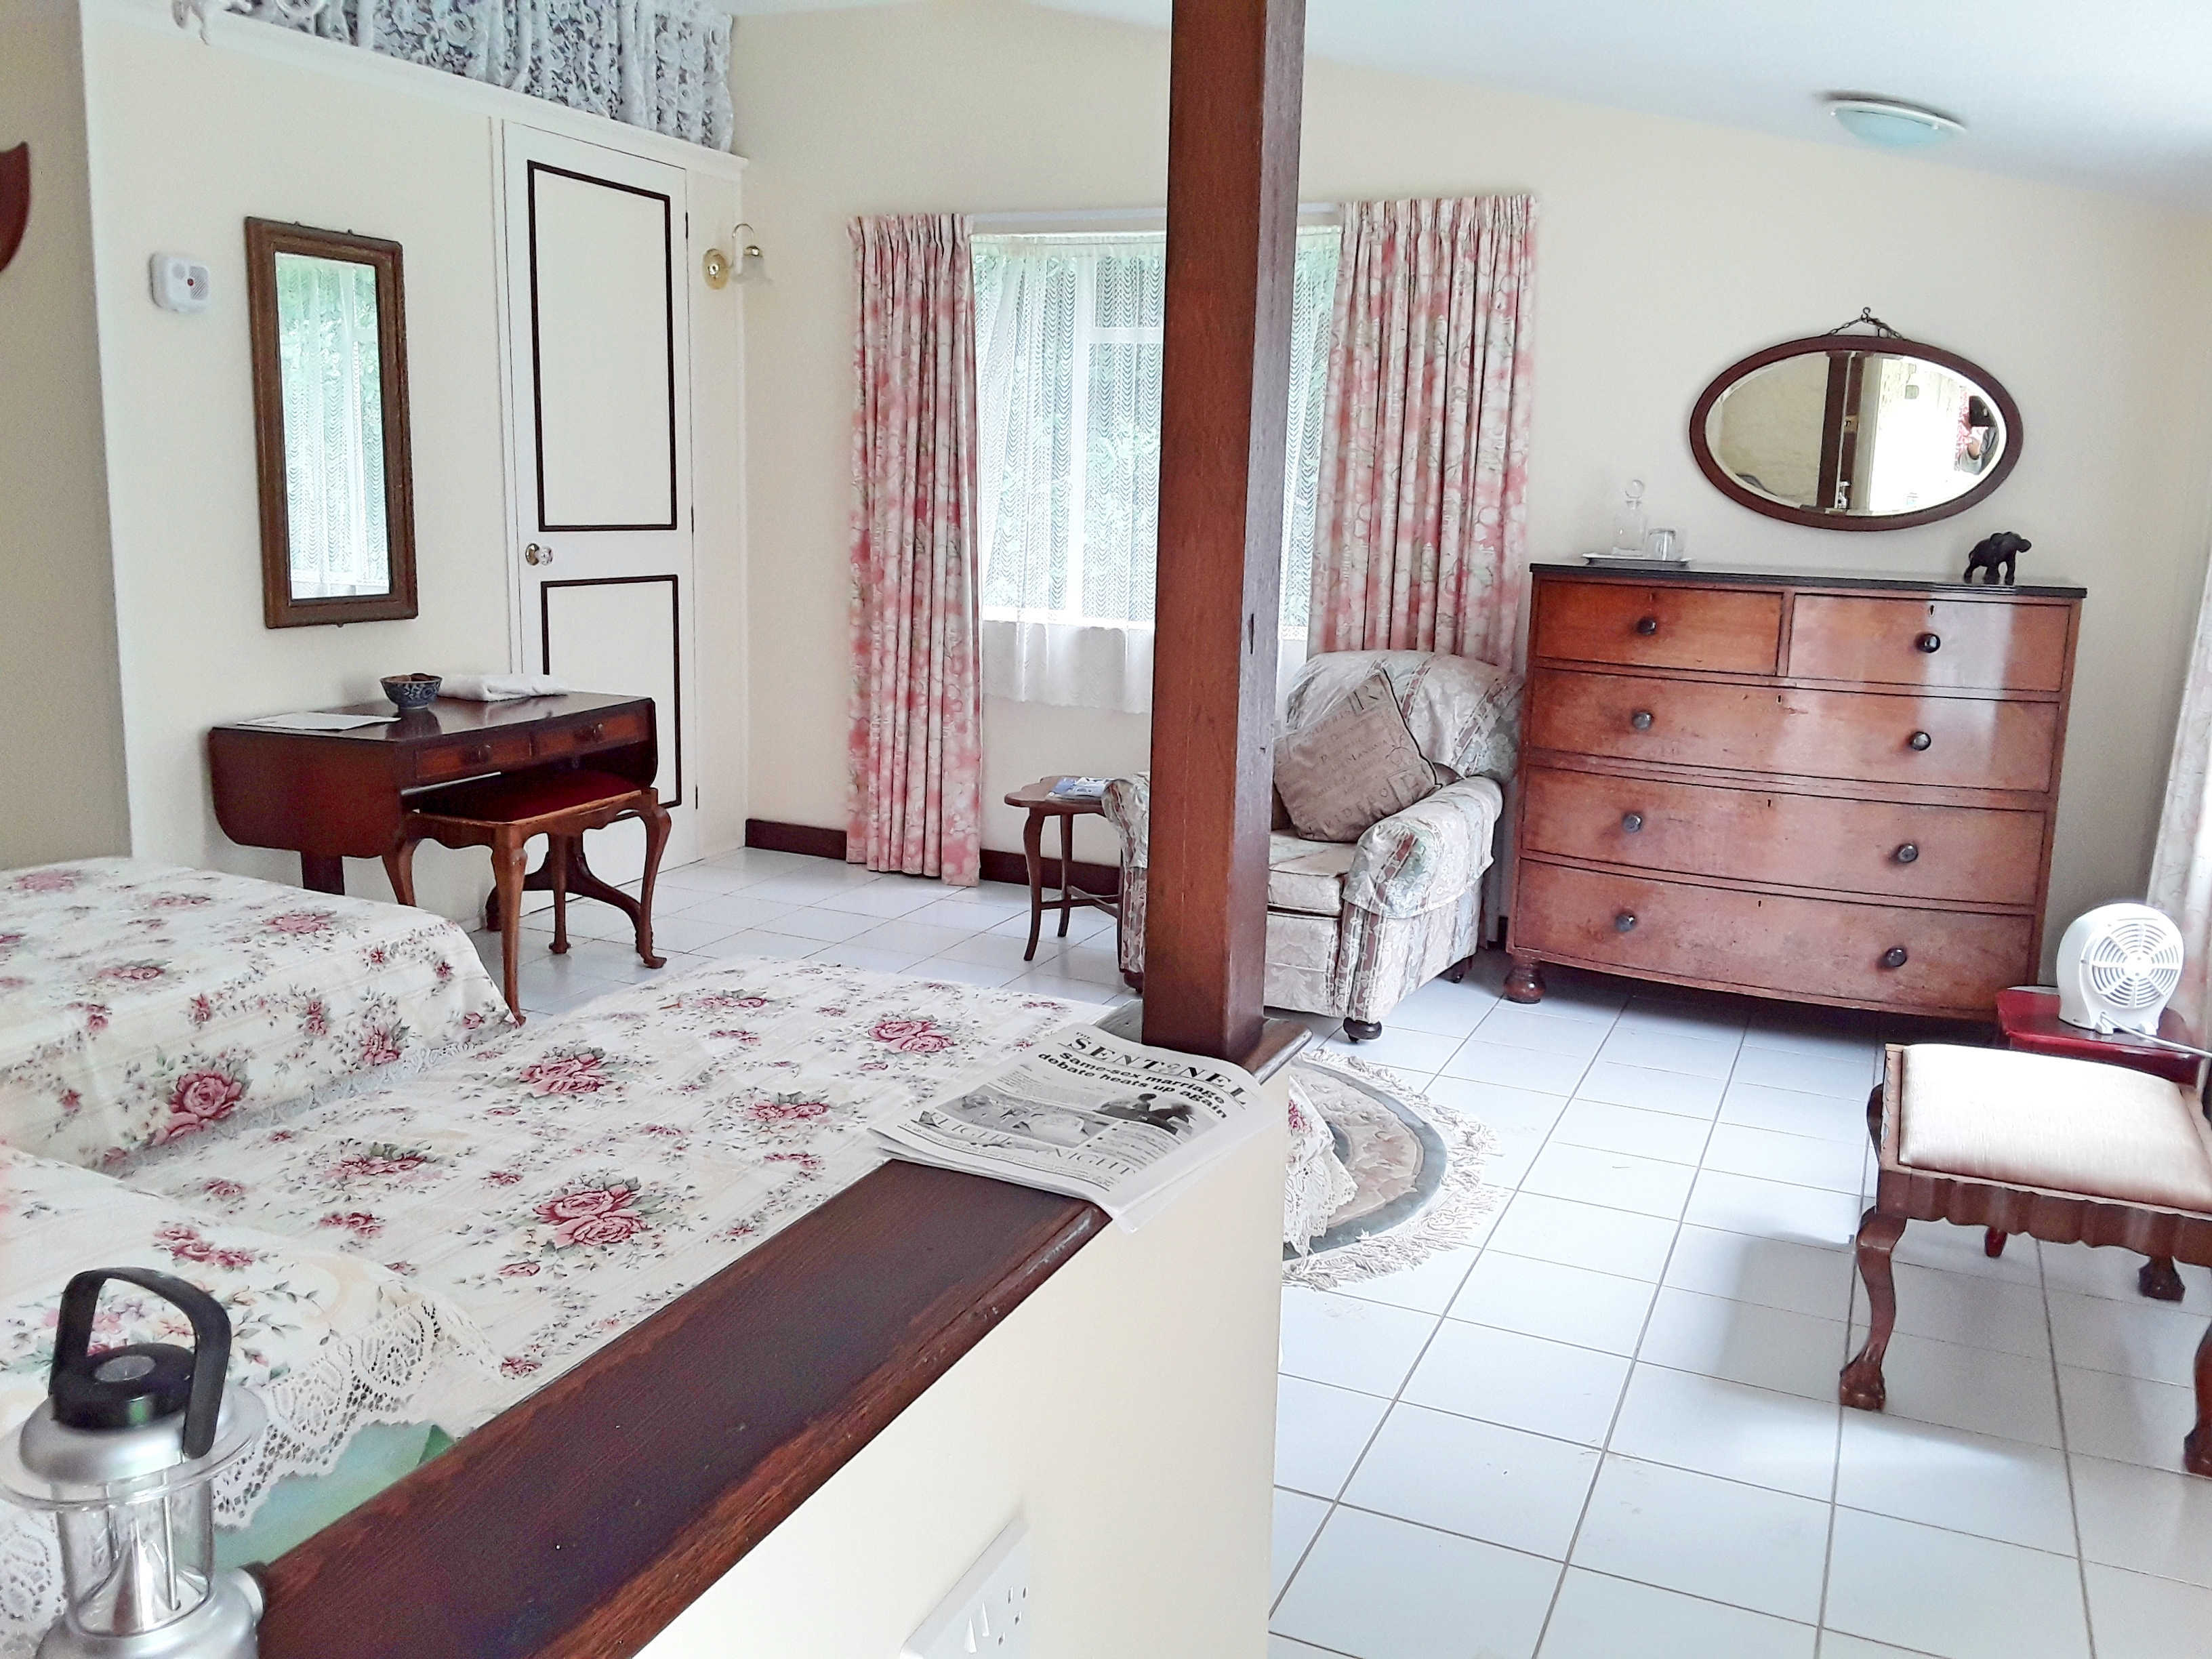 Farm Lodge - Room 5 (Garden Room)